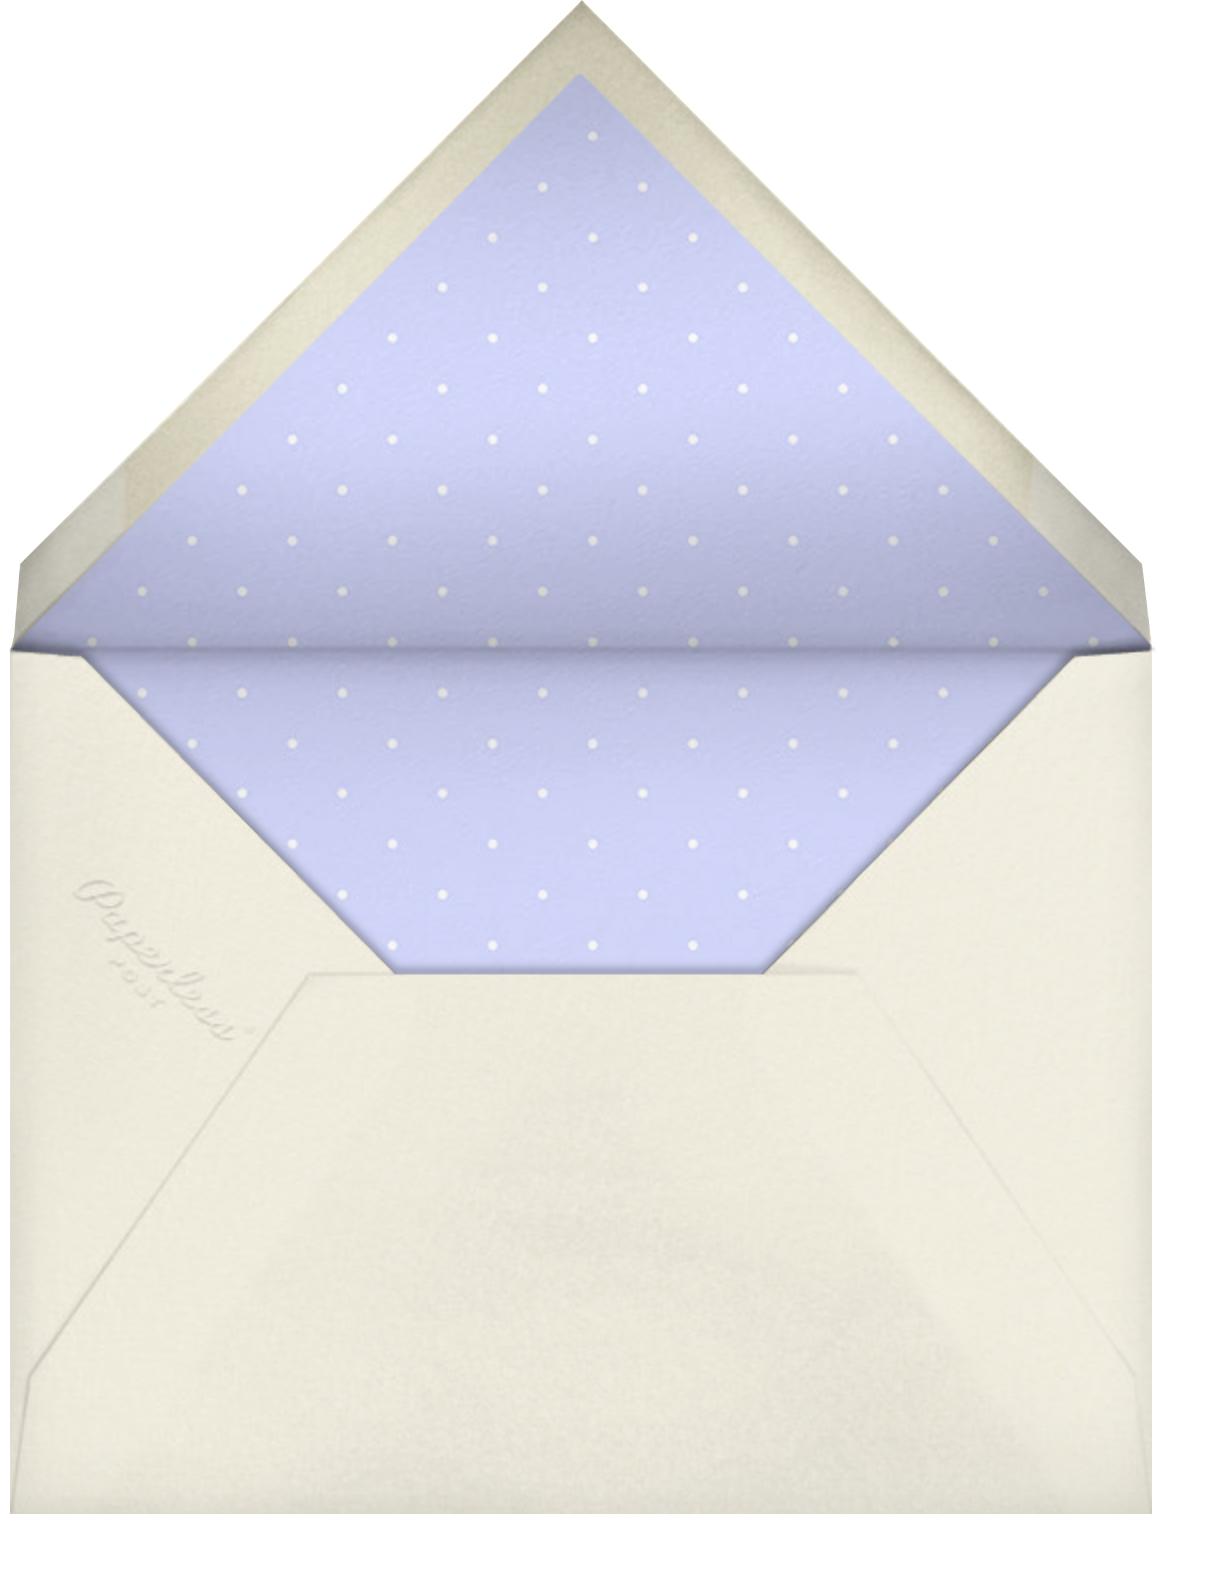 I Love New York - Wisteria - Mr. Boddington's Studio - Moving - envelope back